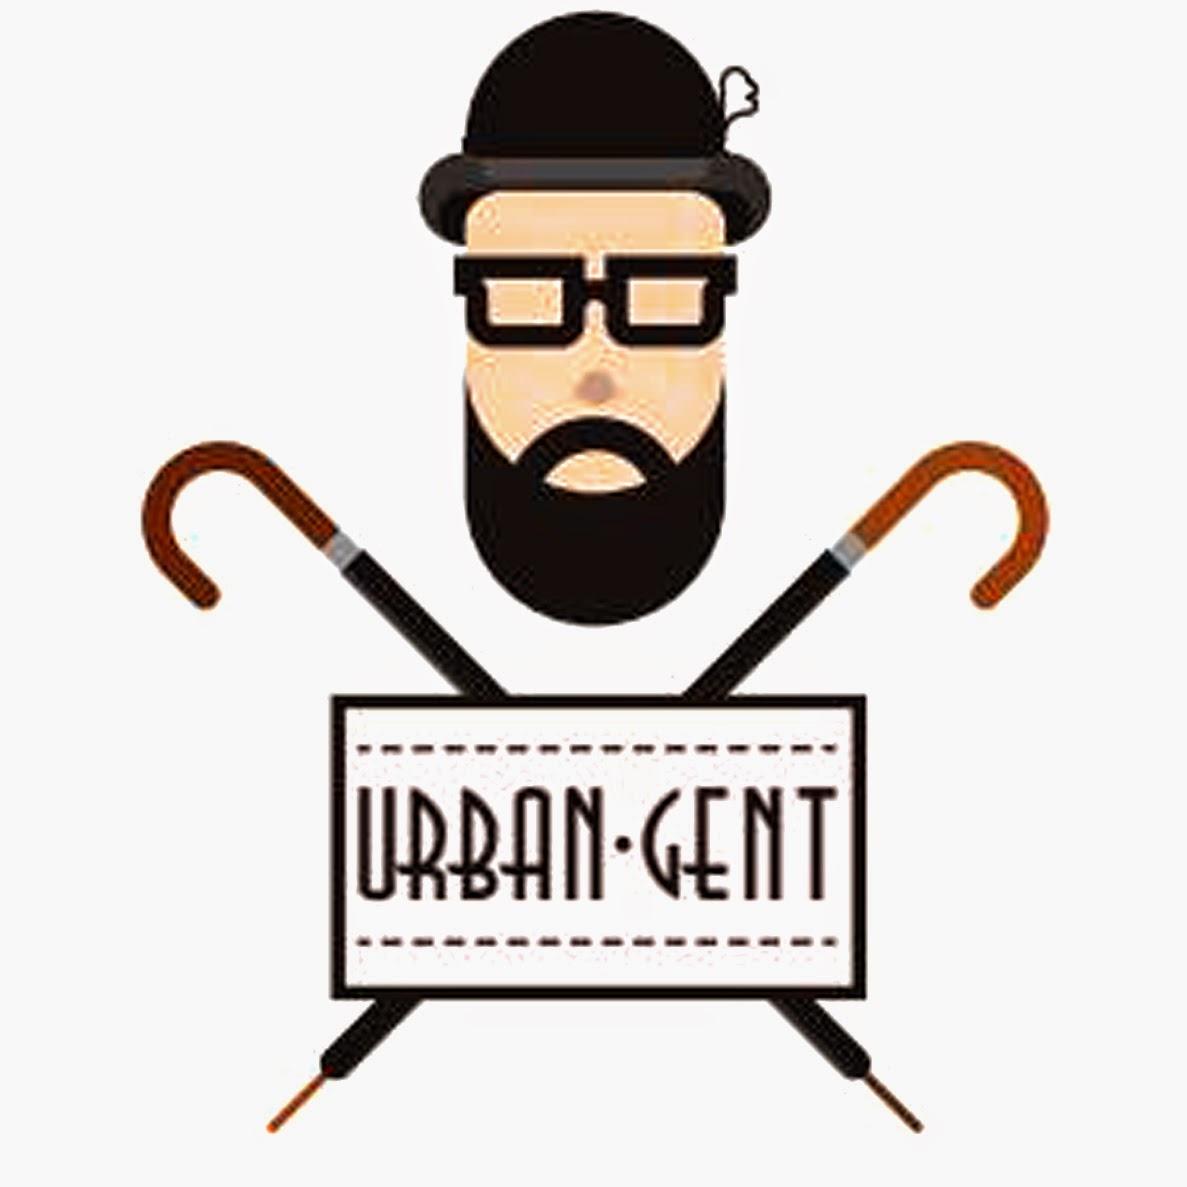 @ Urban Gent